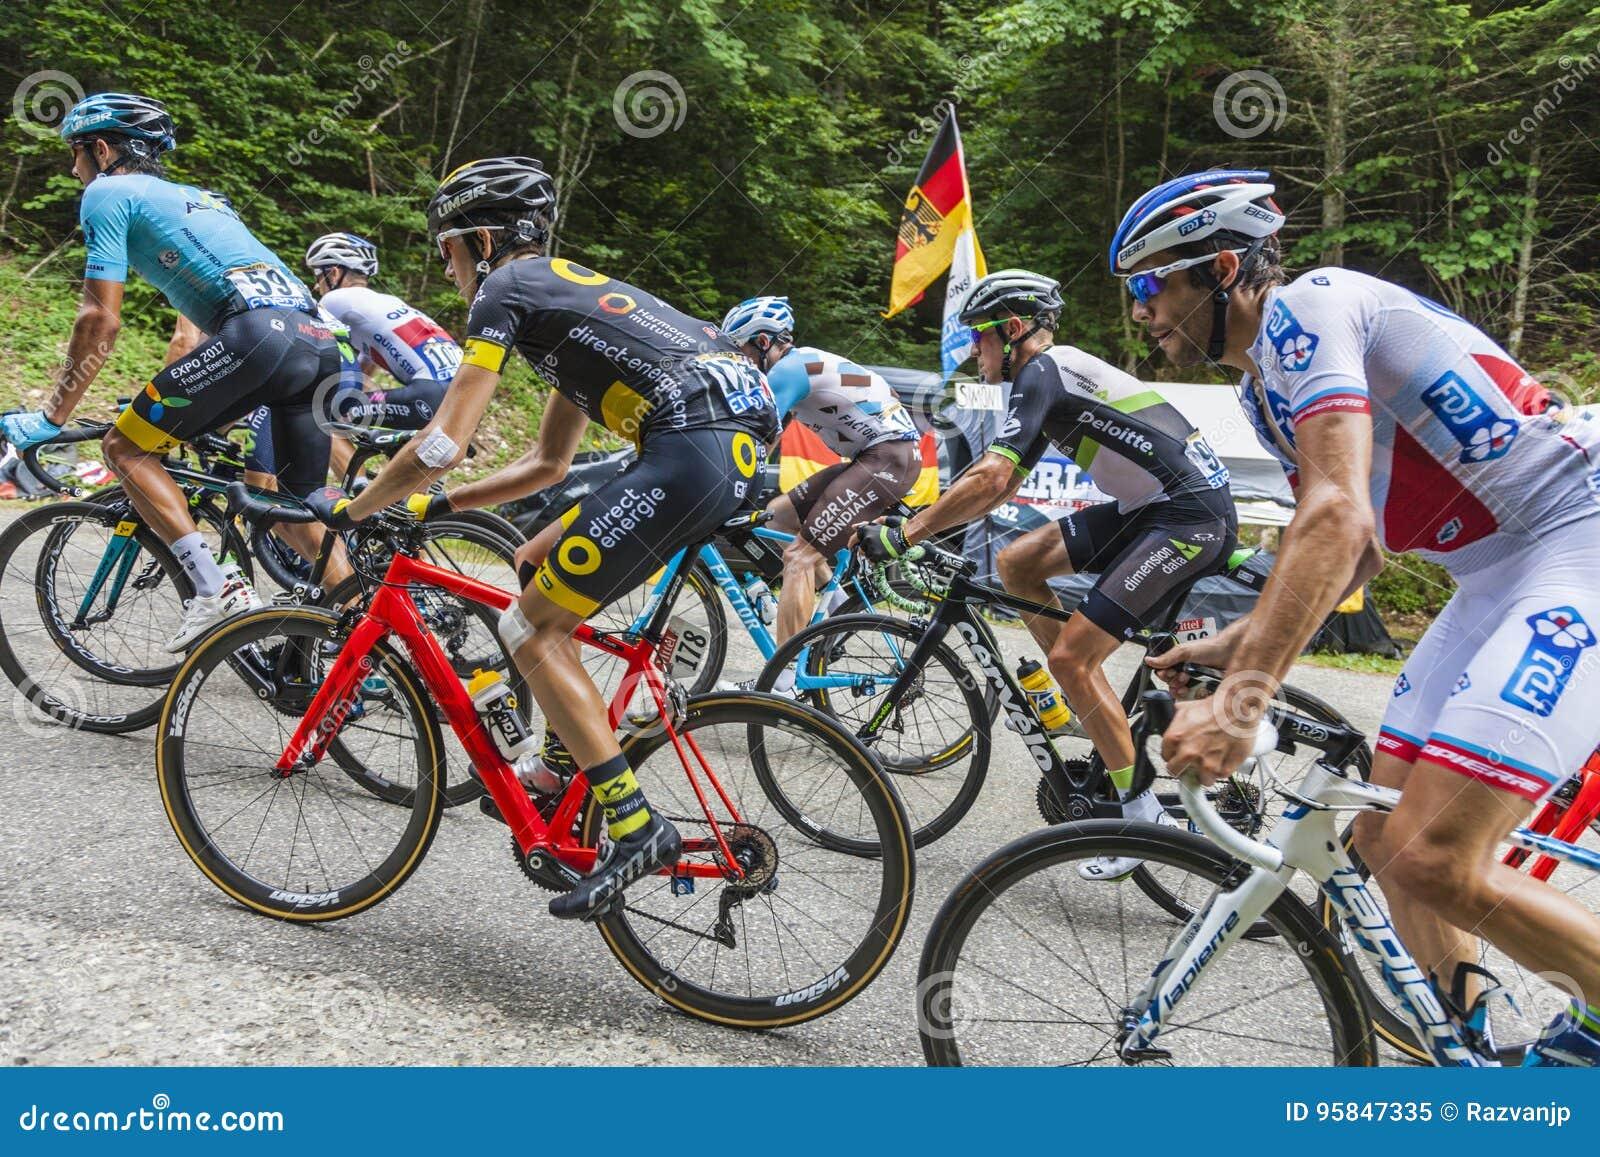 b0f6482f5 Inside The Peloton Tour De France 2017 Editorial Image Image  95847335